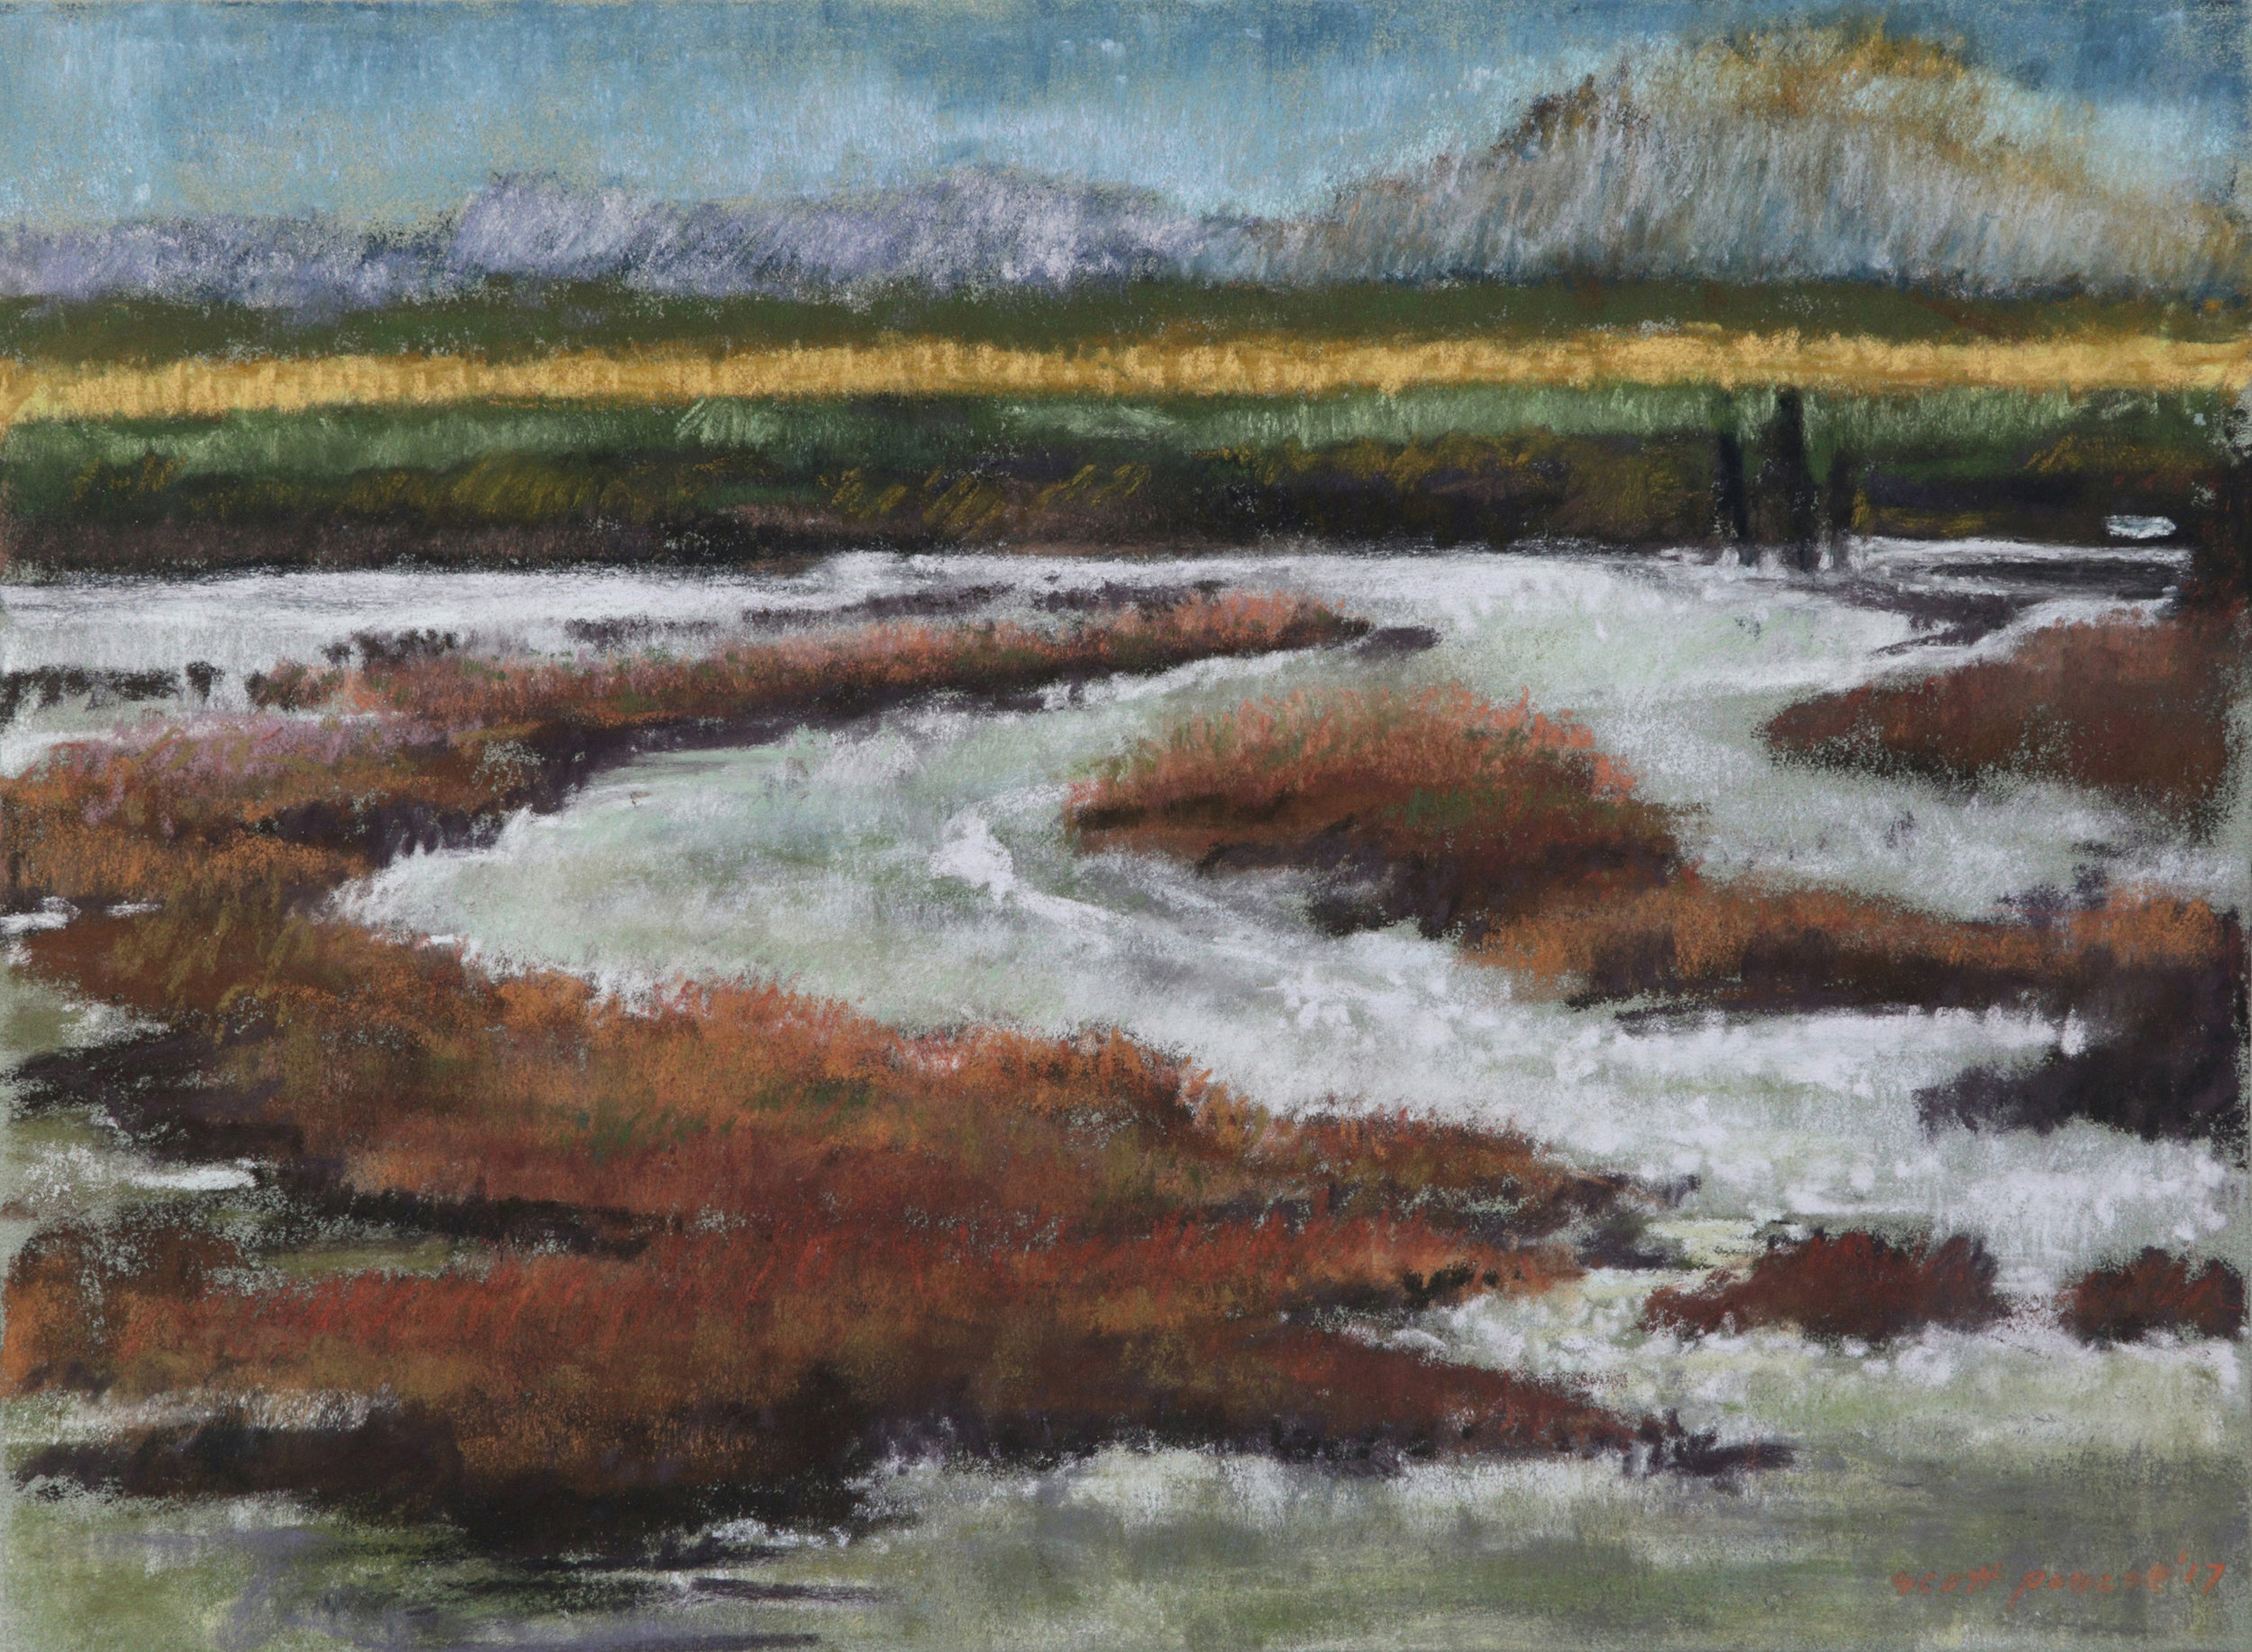 Skagit Slough Outgoing Tide 12x16 Soft Pastel